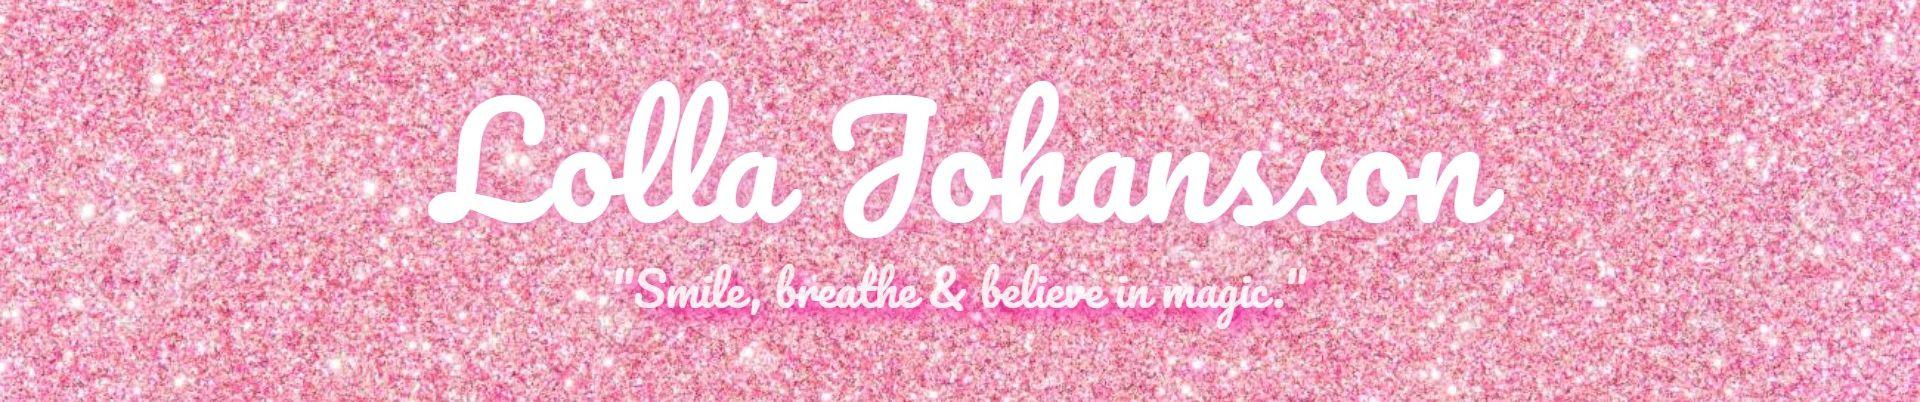 Lolla Johansson S Likes On Soundcloud Listen To Music